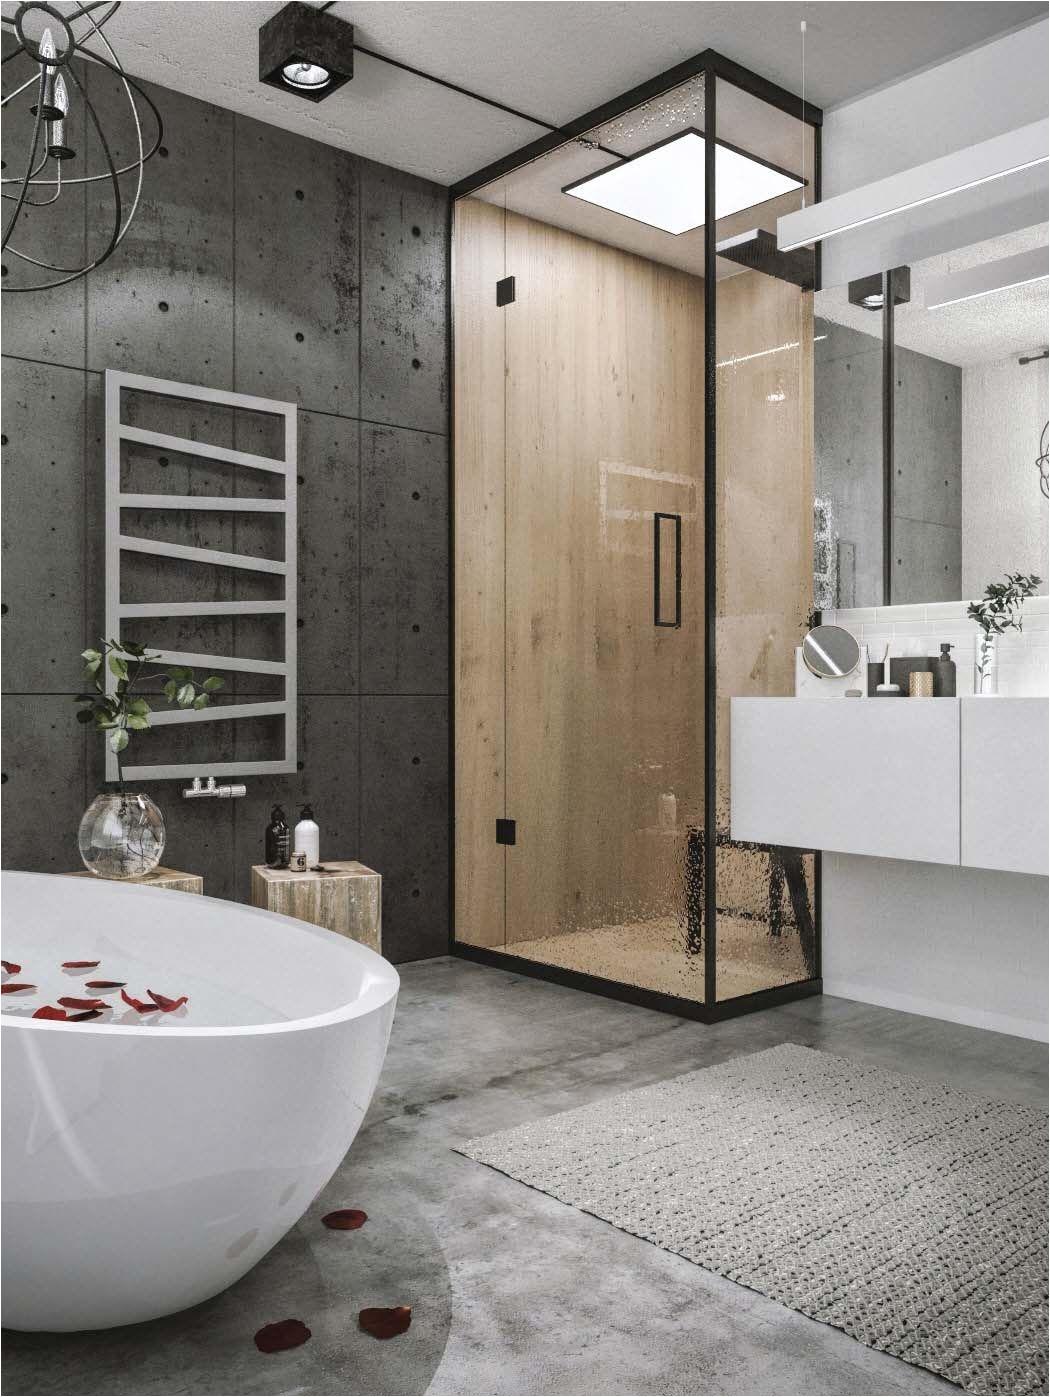 Loft Bathroom Ideas Design Chic Industrial Loft In Lithuania S Modern Updates